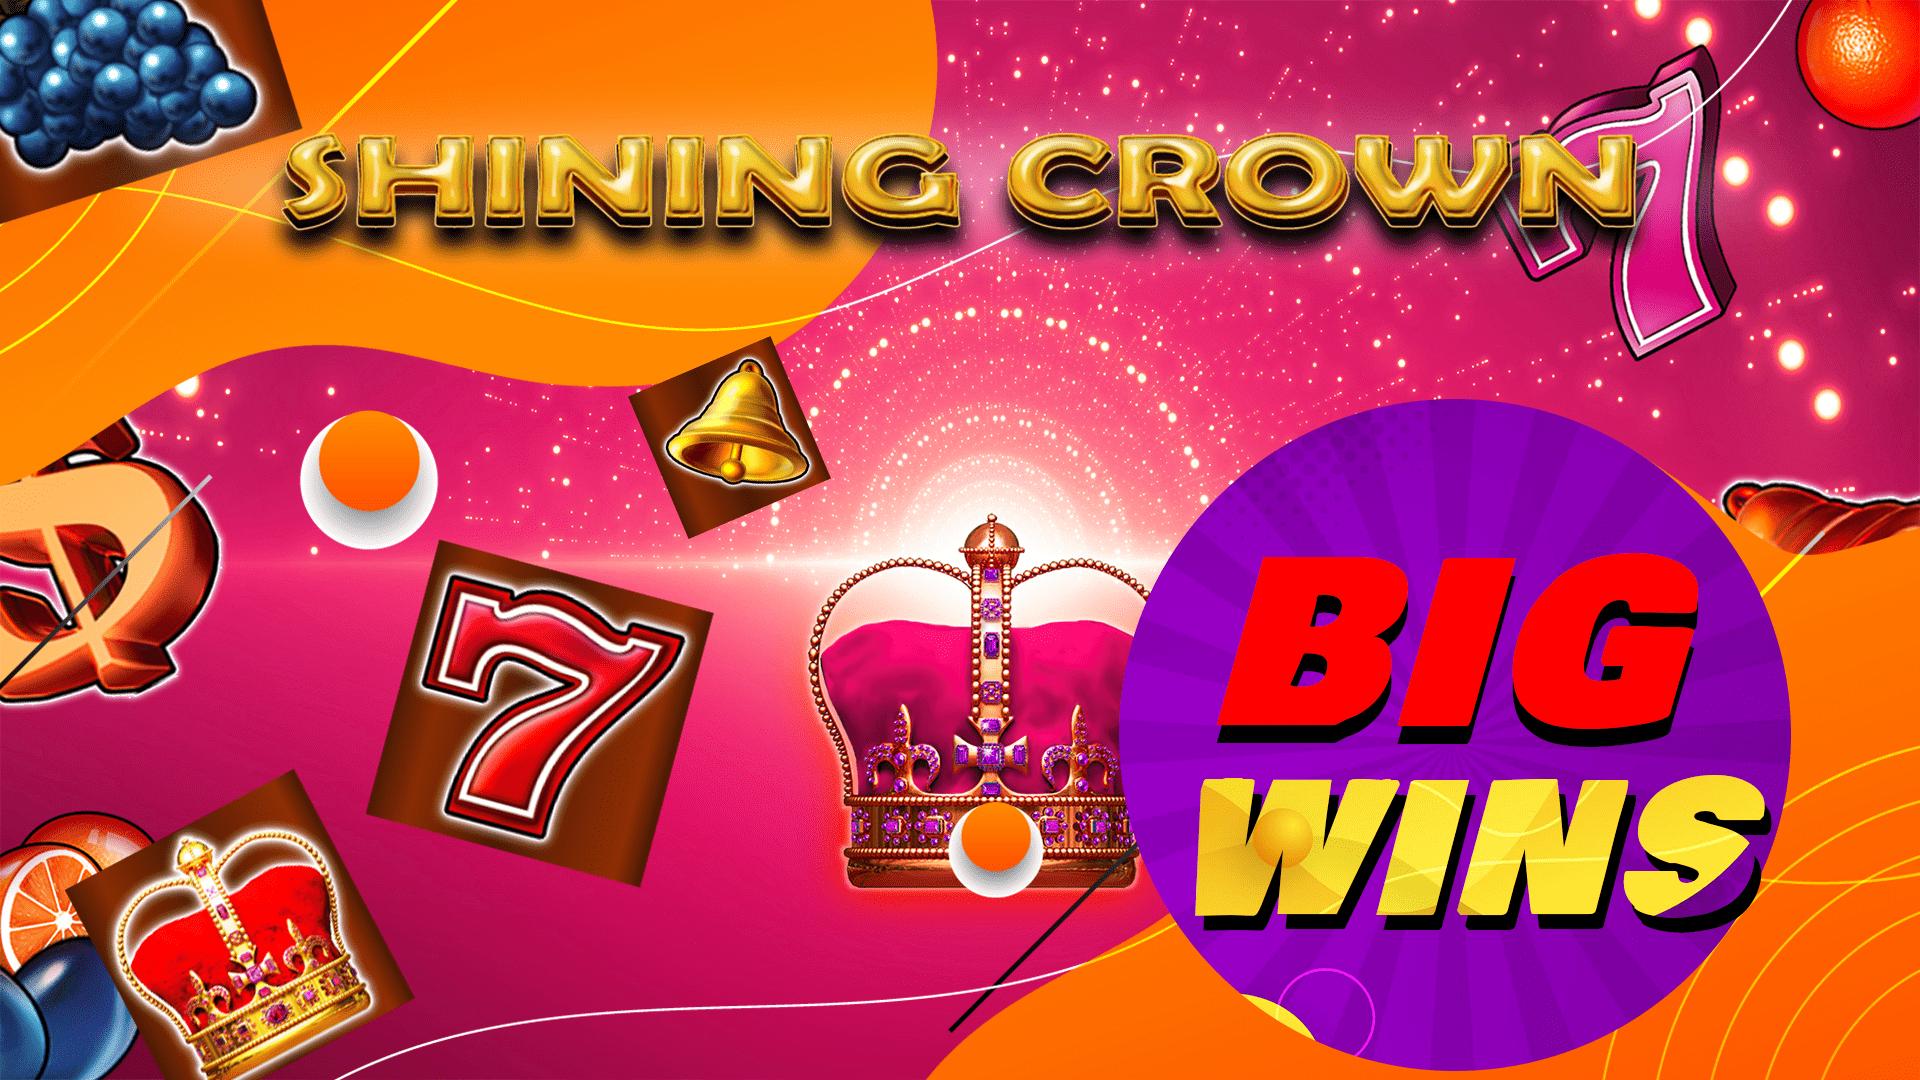 Shining-crown-big-win